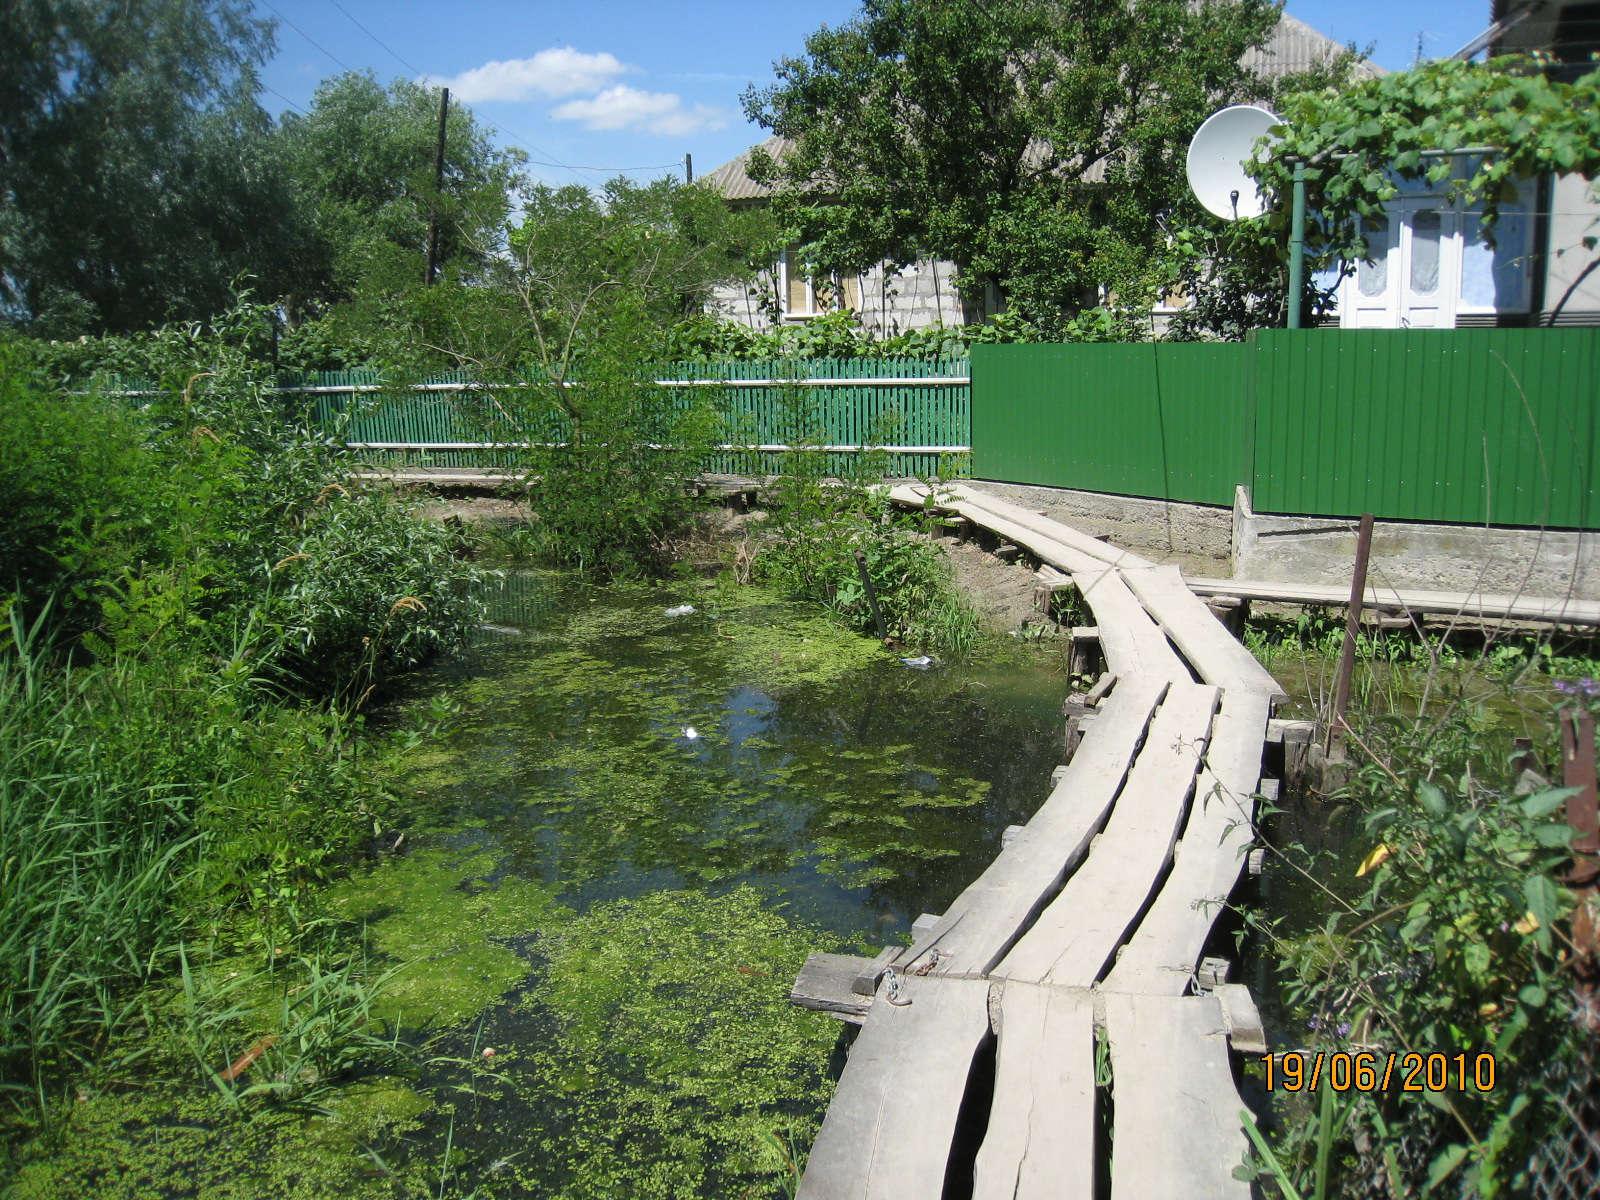 vilkovo-neobichnyj-gorodok-0-kilometr-0-